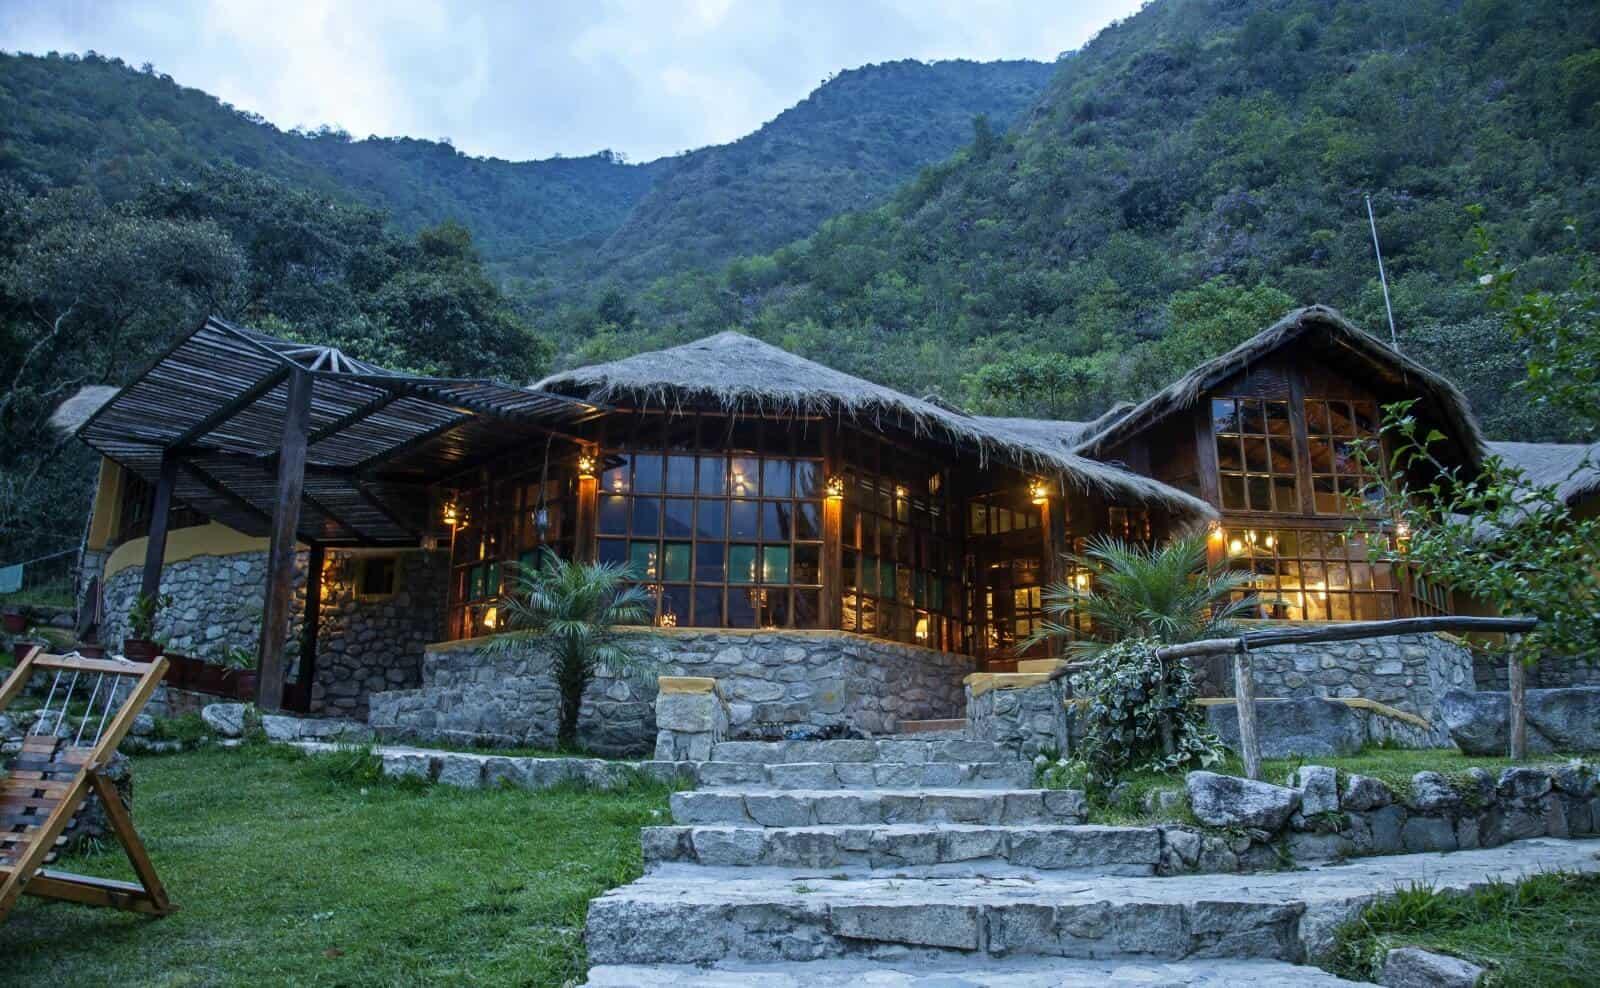 Mountain Lodges of Peru